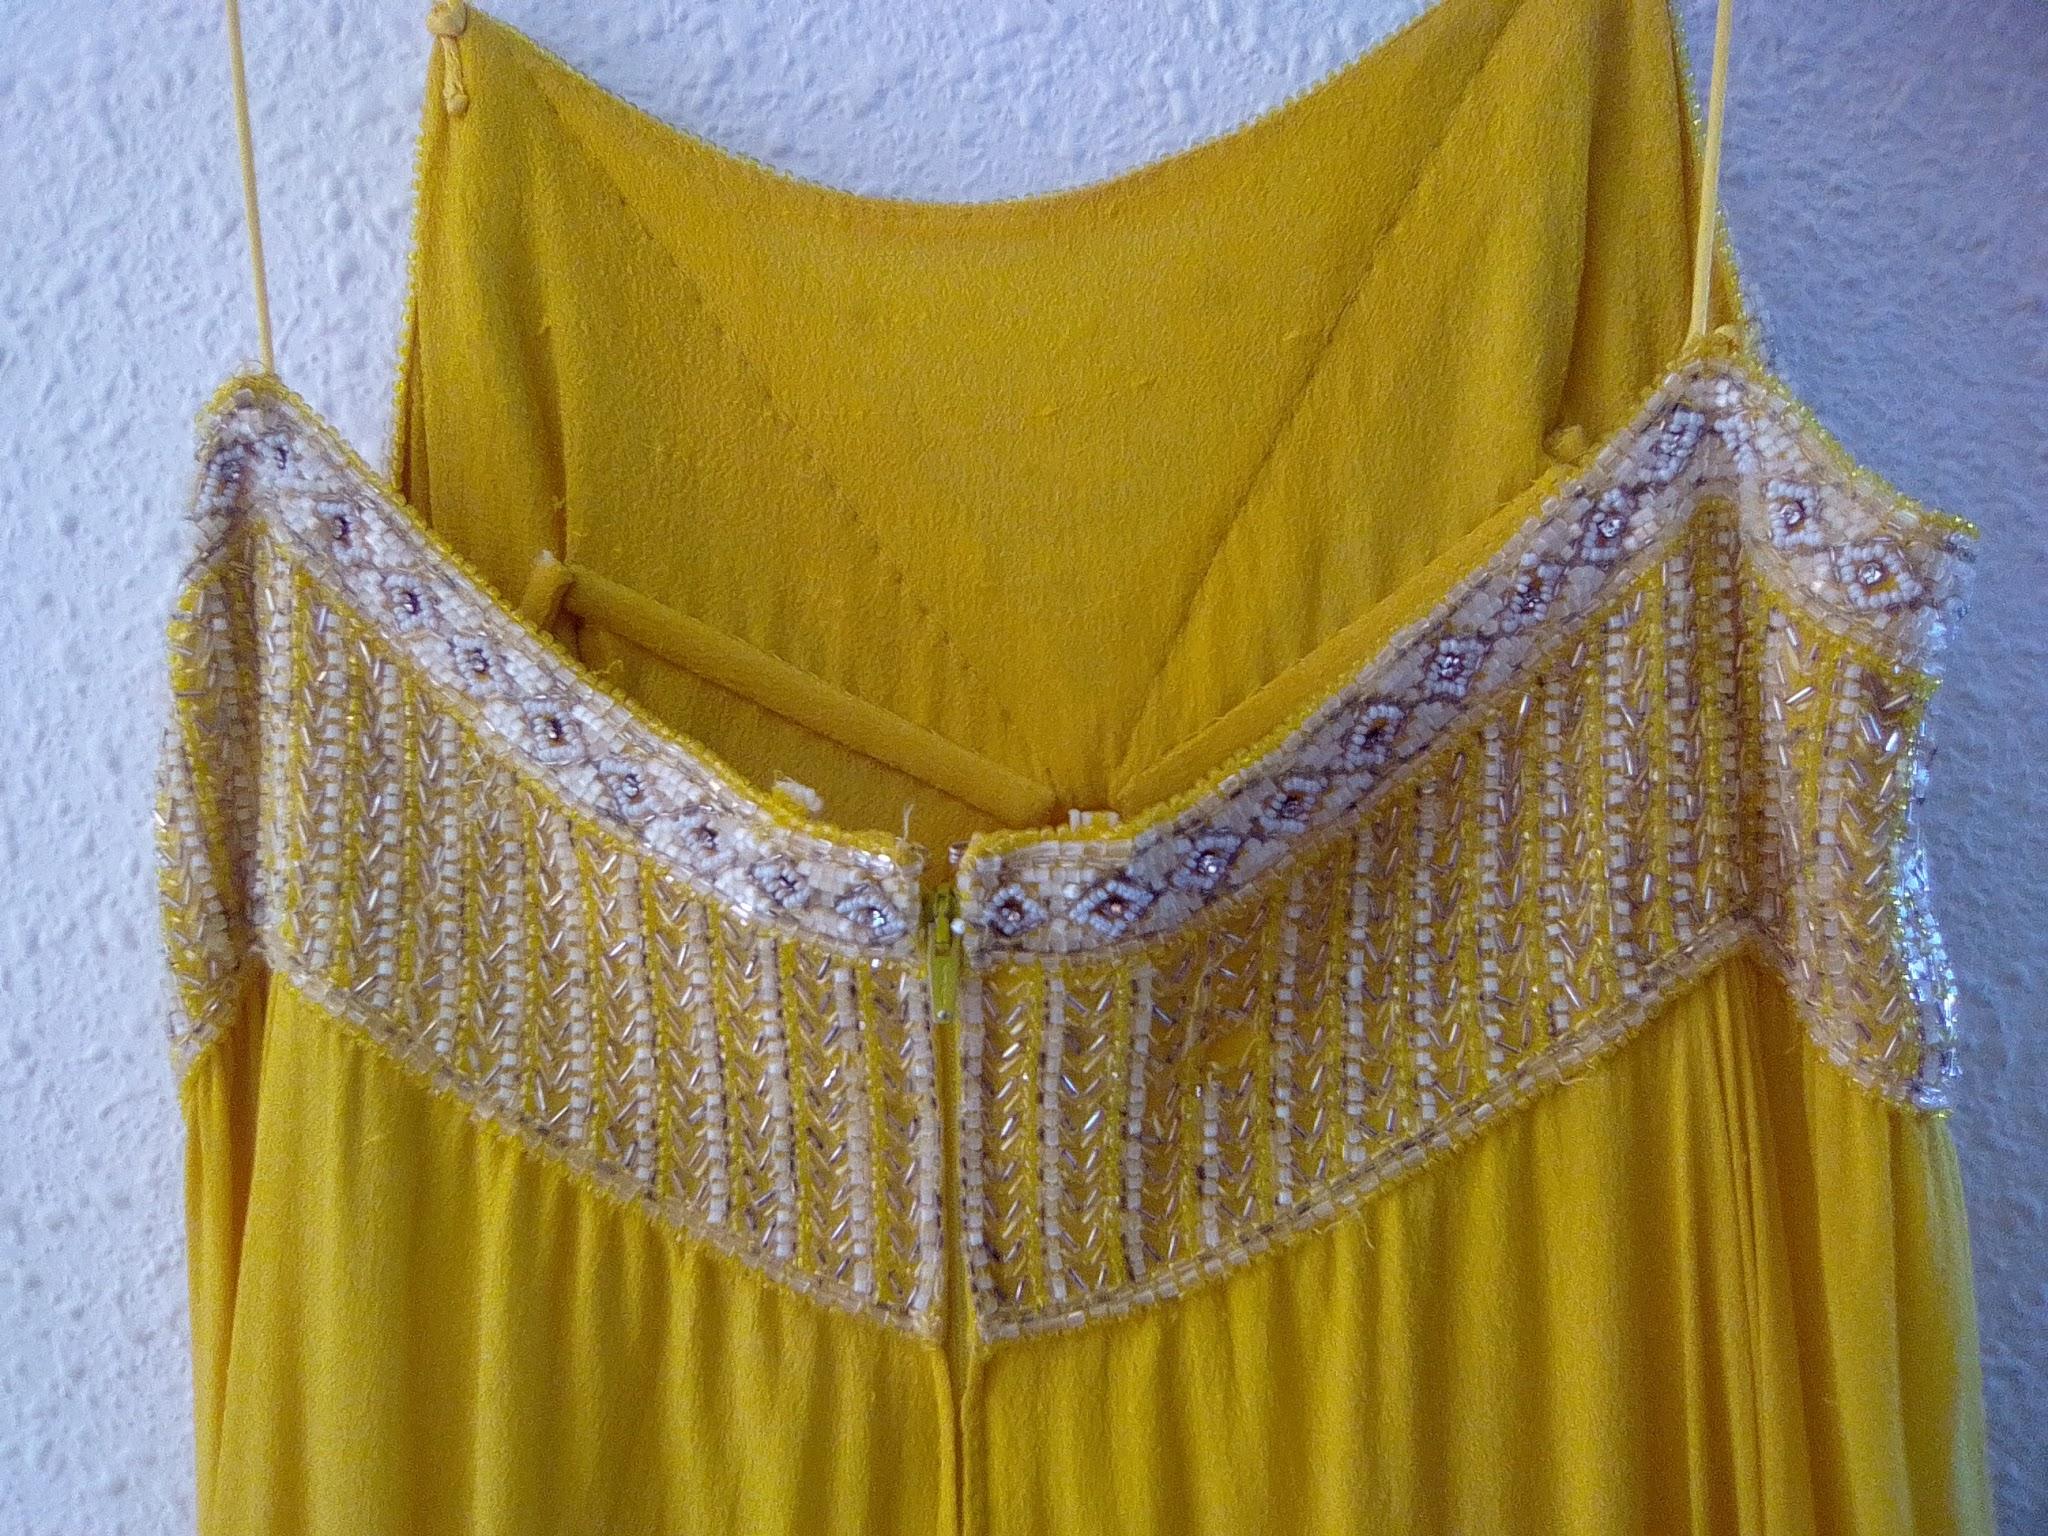 Vintage Nina Ricci Original Patron Yellow Gown For Sale